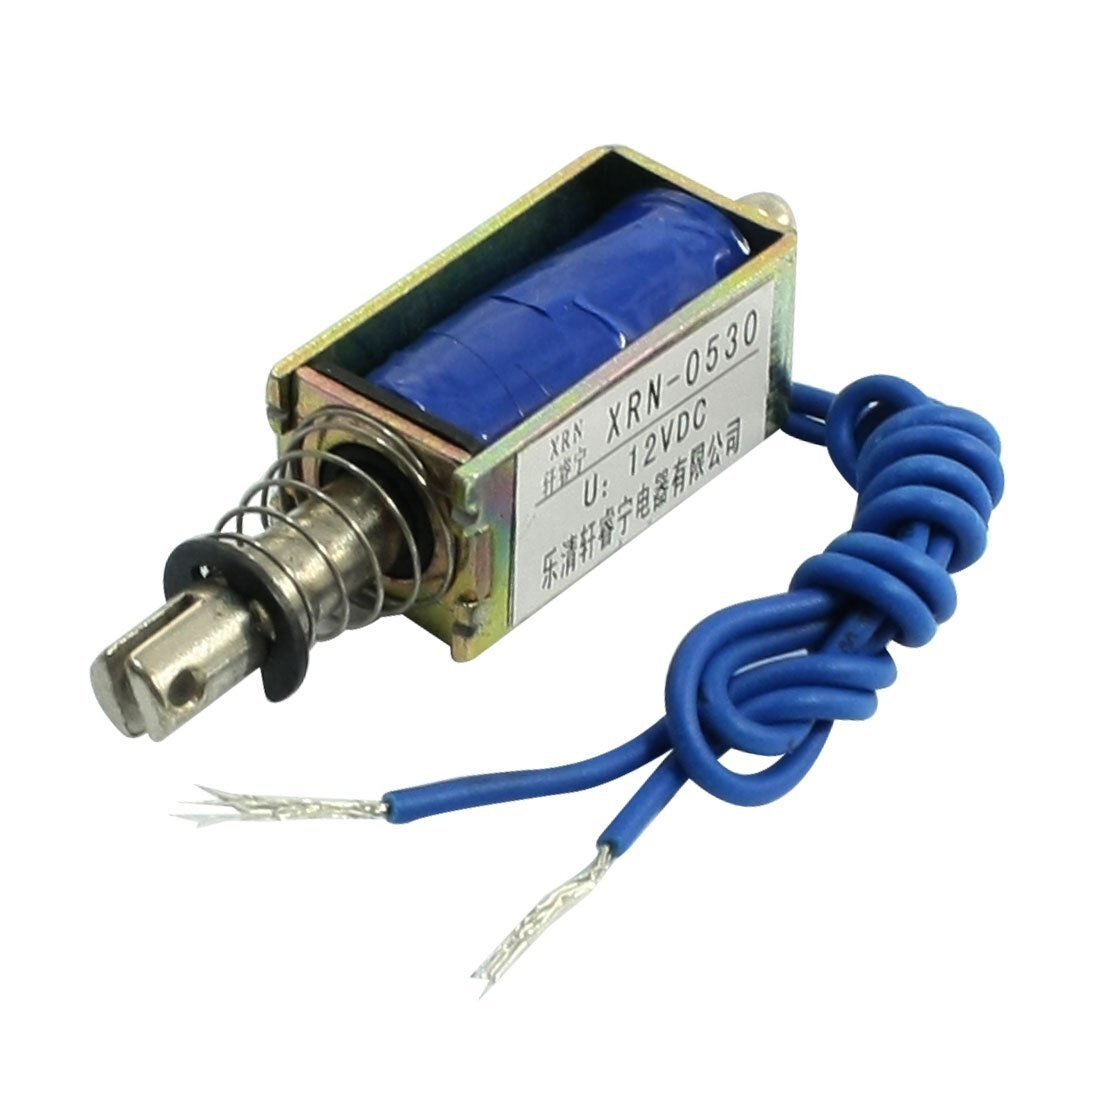 Электромагнитный Электрический электромагнитный ТИП push/pull 10 мм DC 12 V 2,1 кг сила